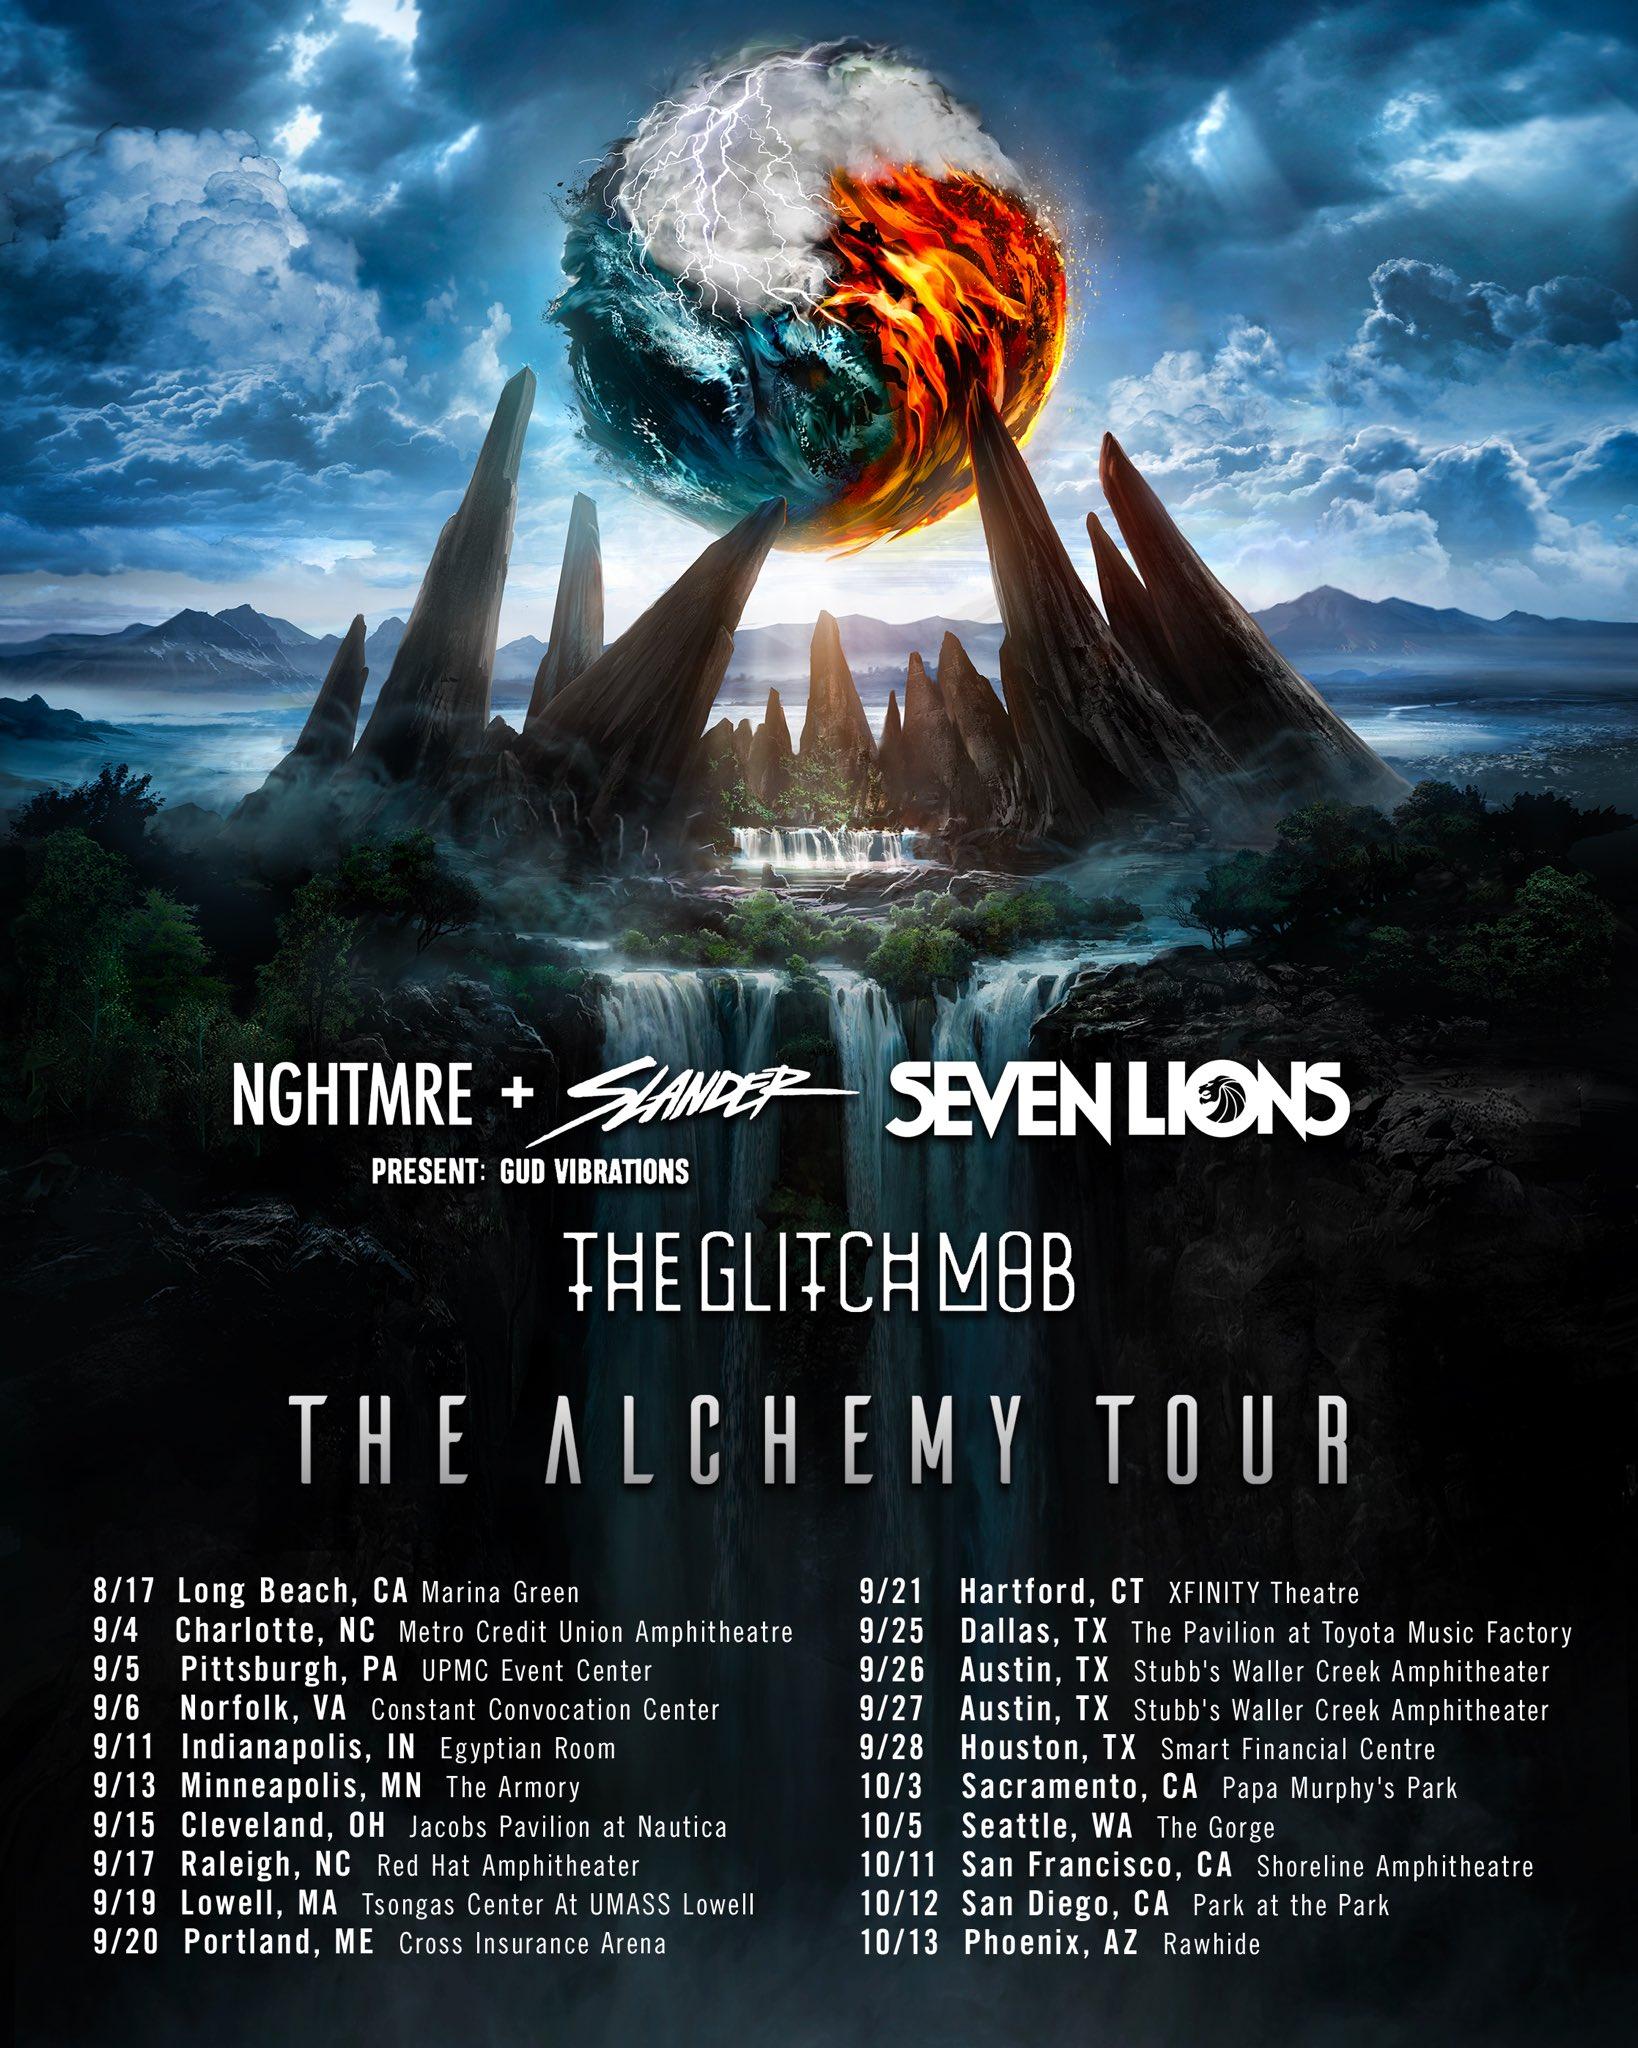 The Alchemy Tour 2019 Dates